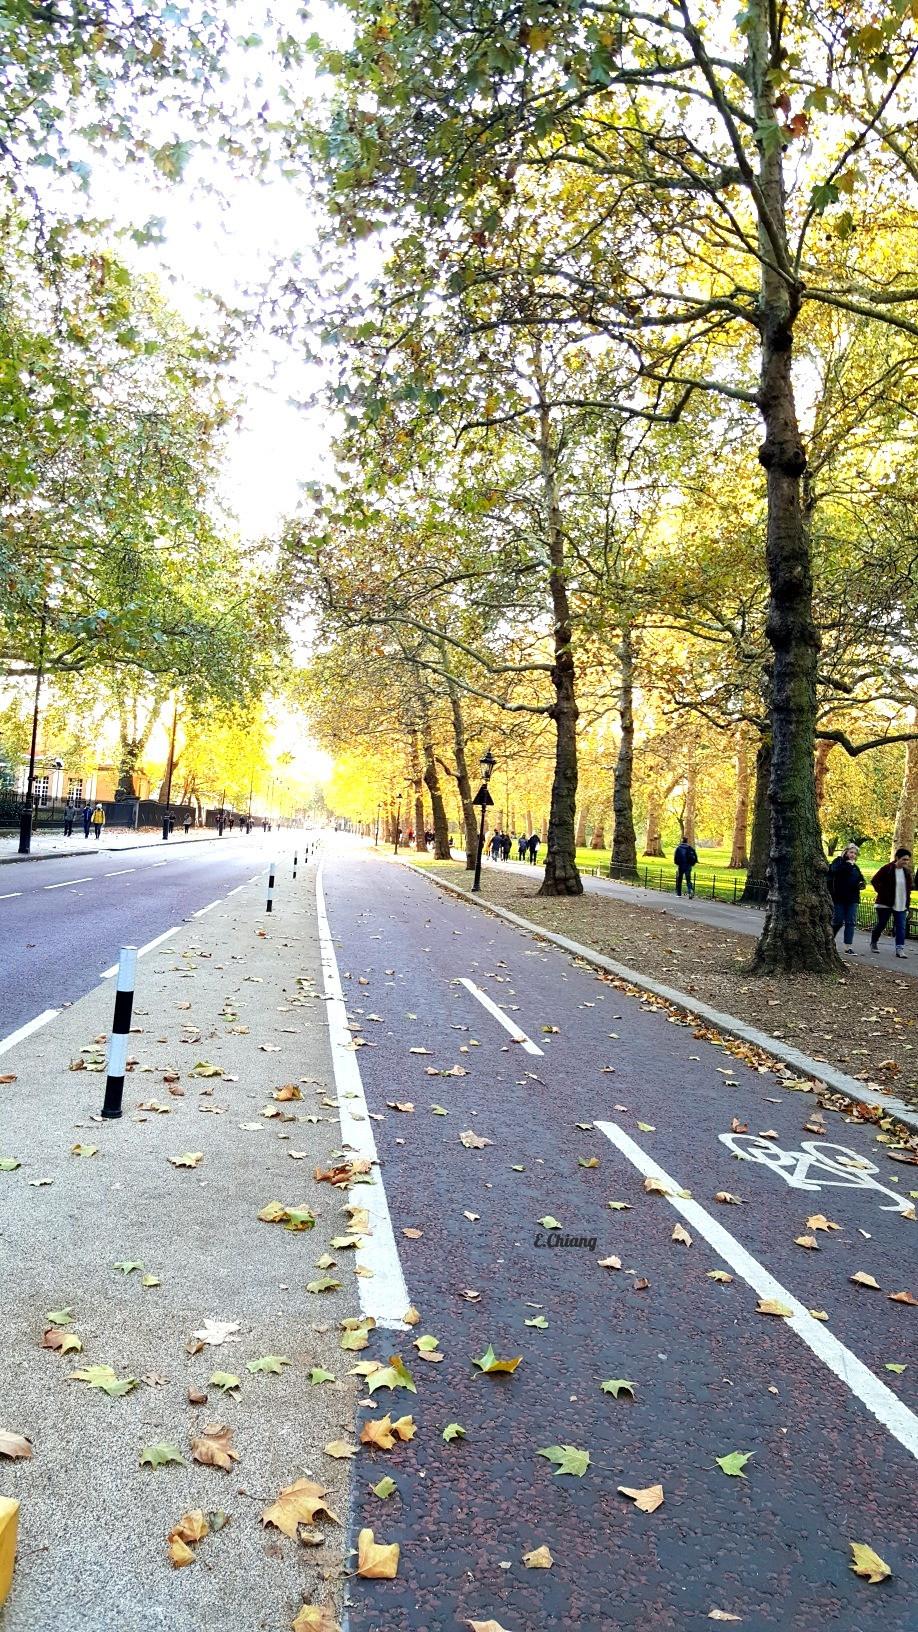 London park near Buckingham palace